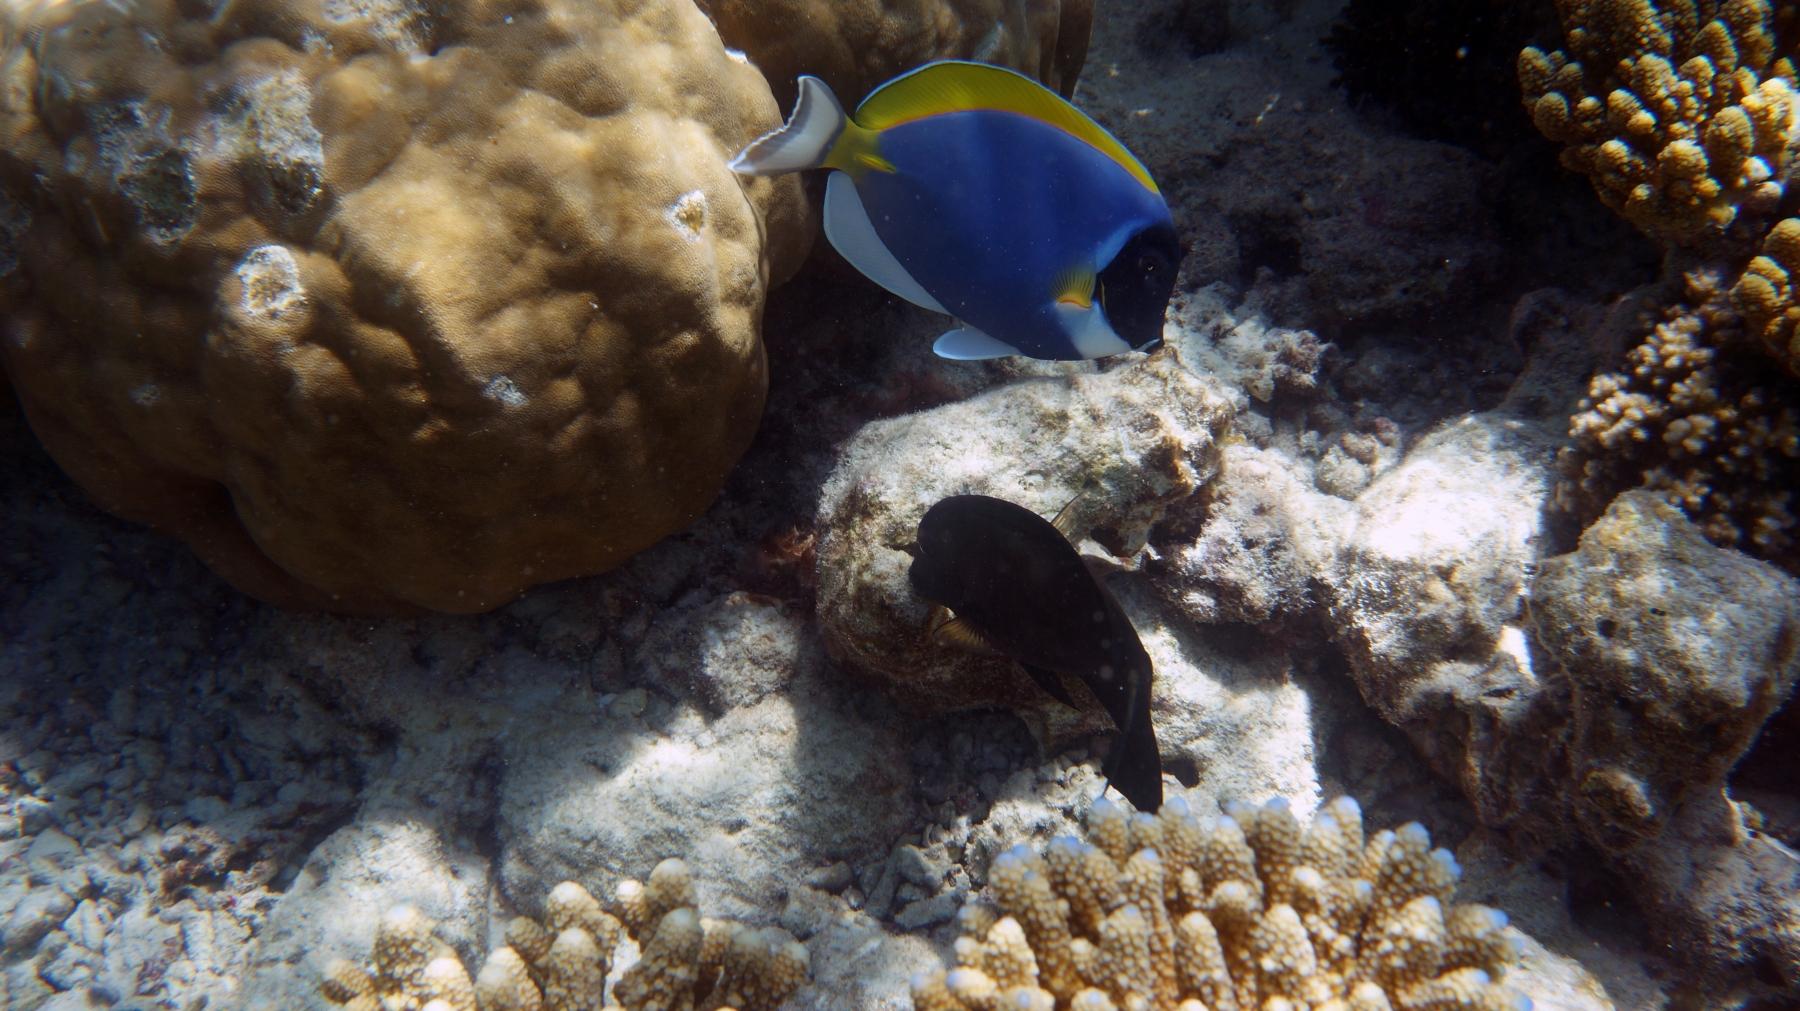 Acanthurus_leucosternon_006_C_Peces-Cirujano_L_Maldivas_U_Sebas_02072015